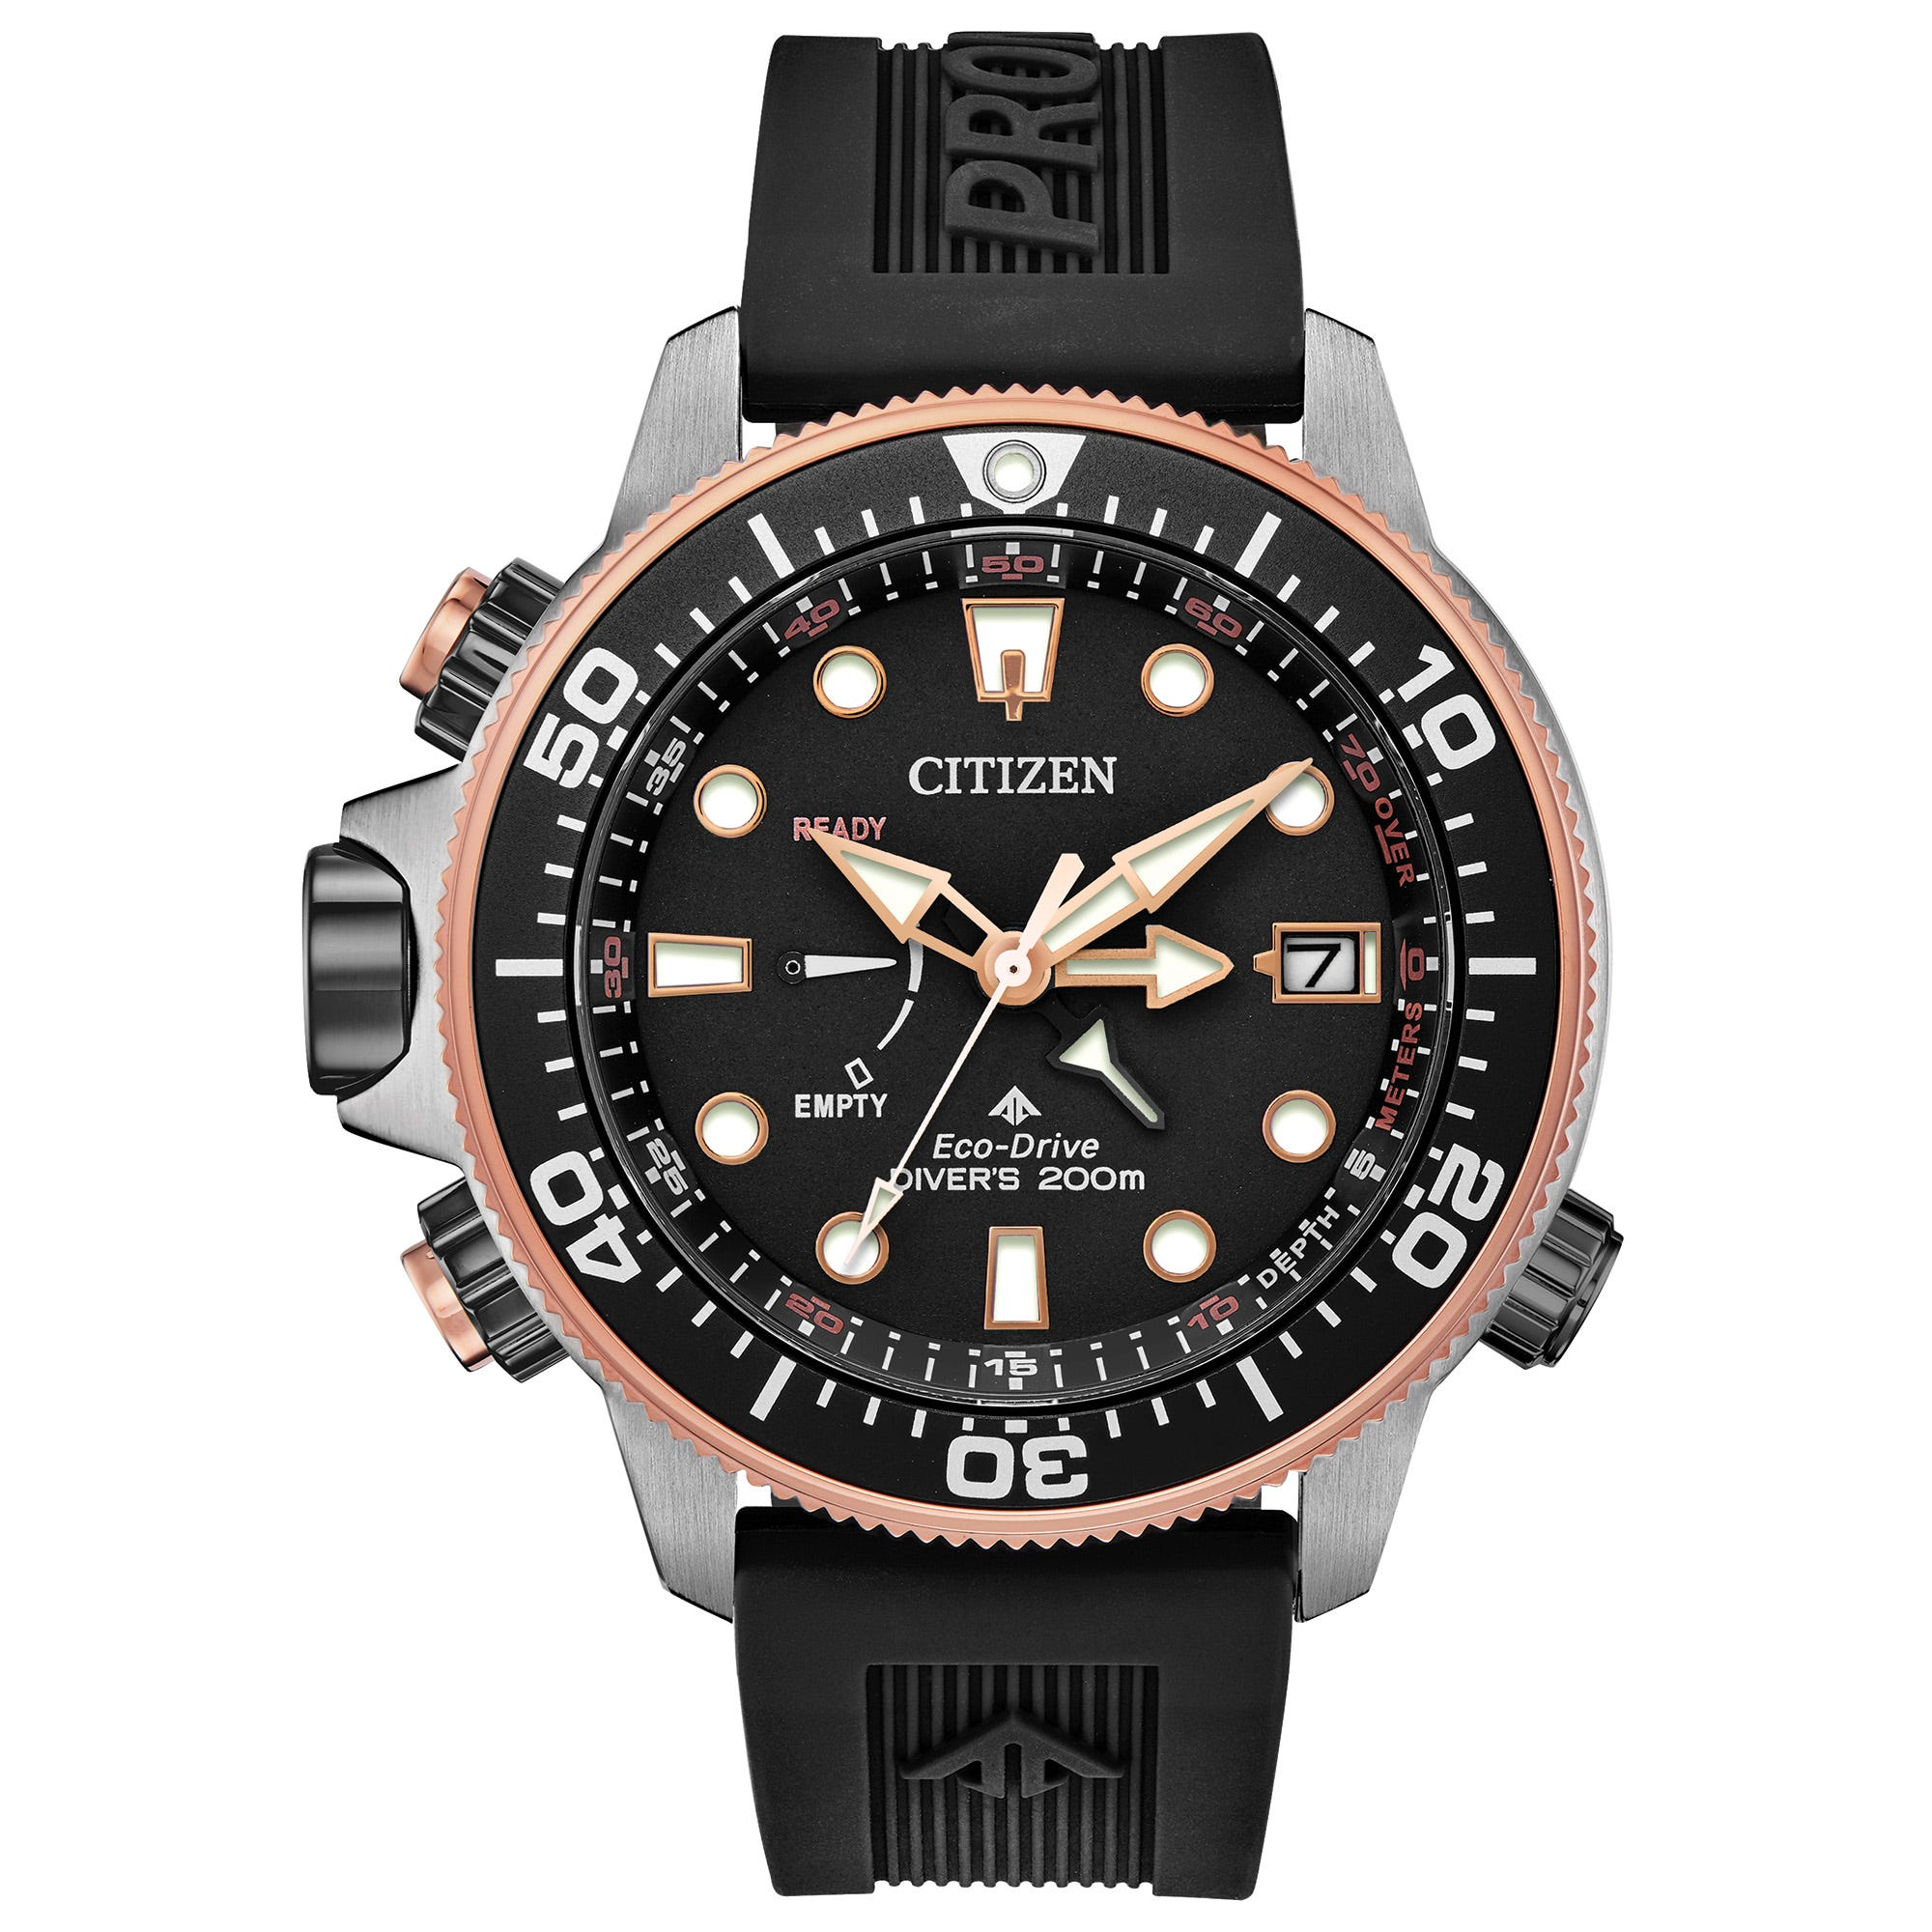 Citizen Men's Promaster Aqualand Watch BN2037-03E